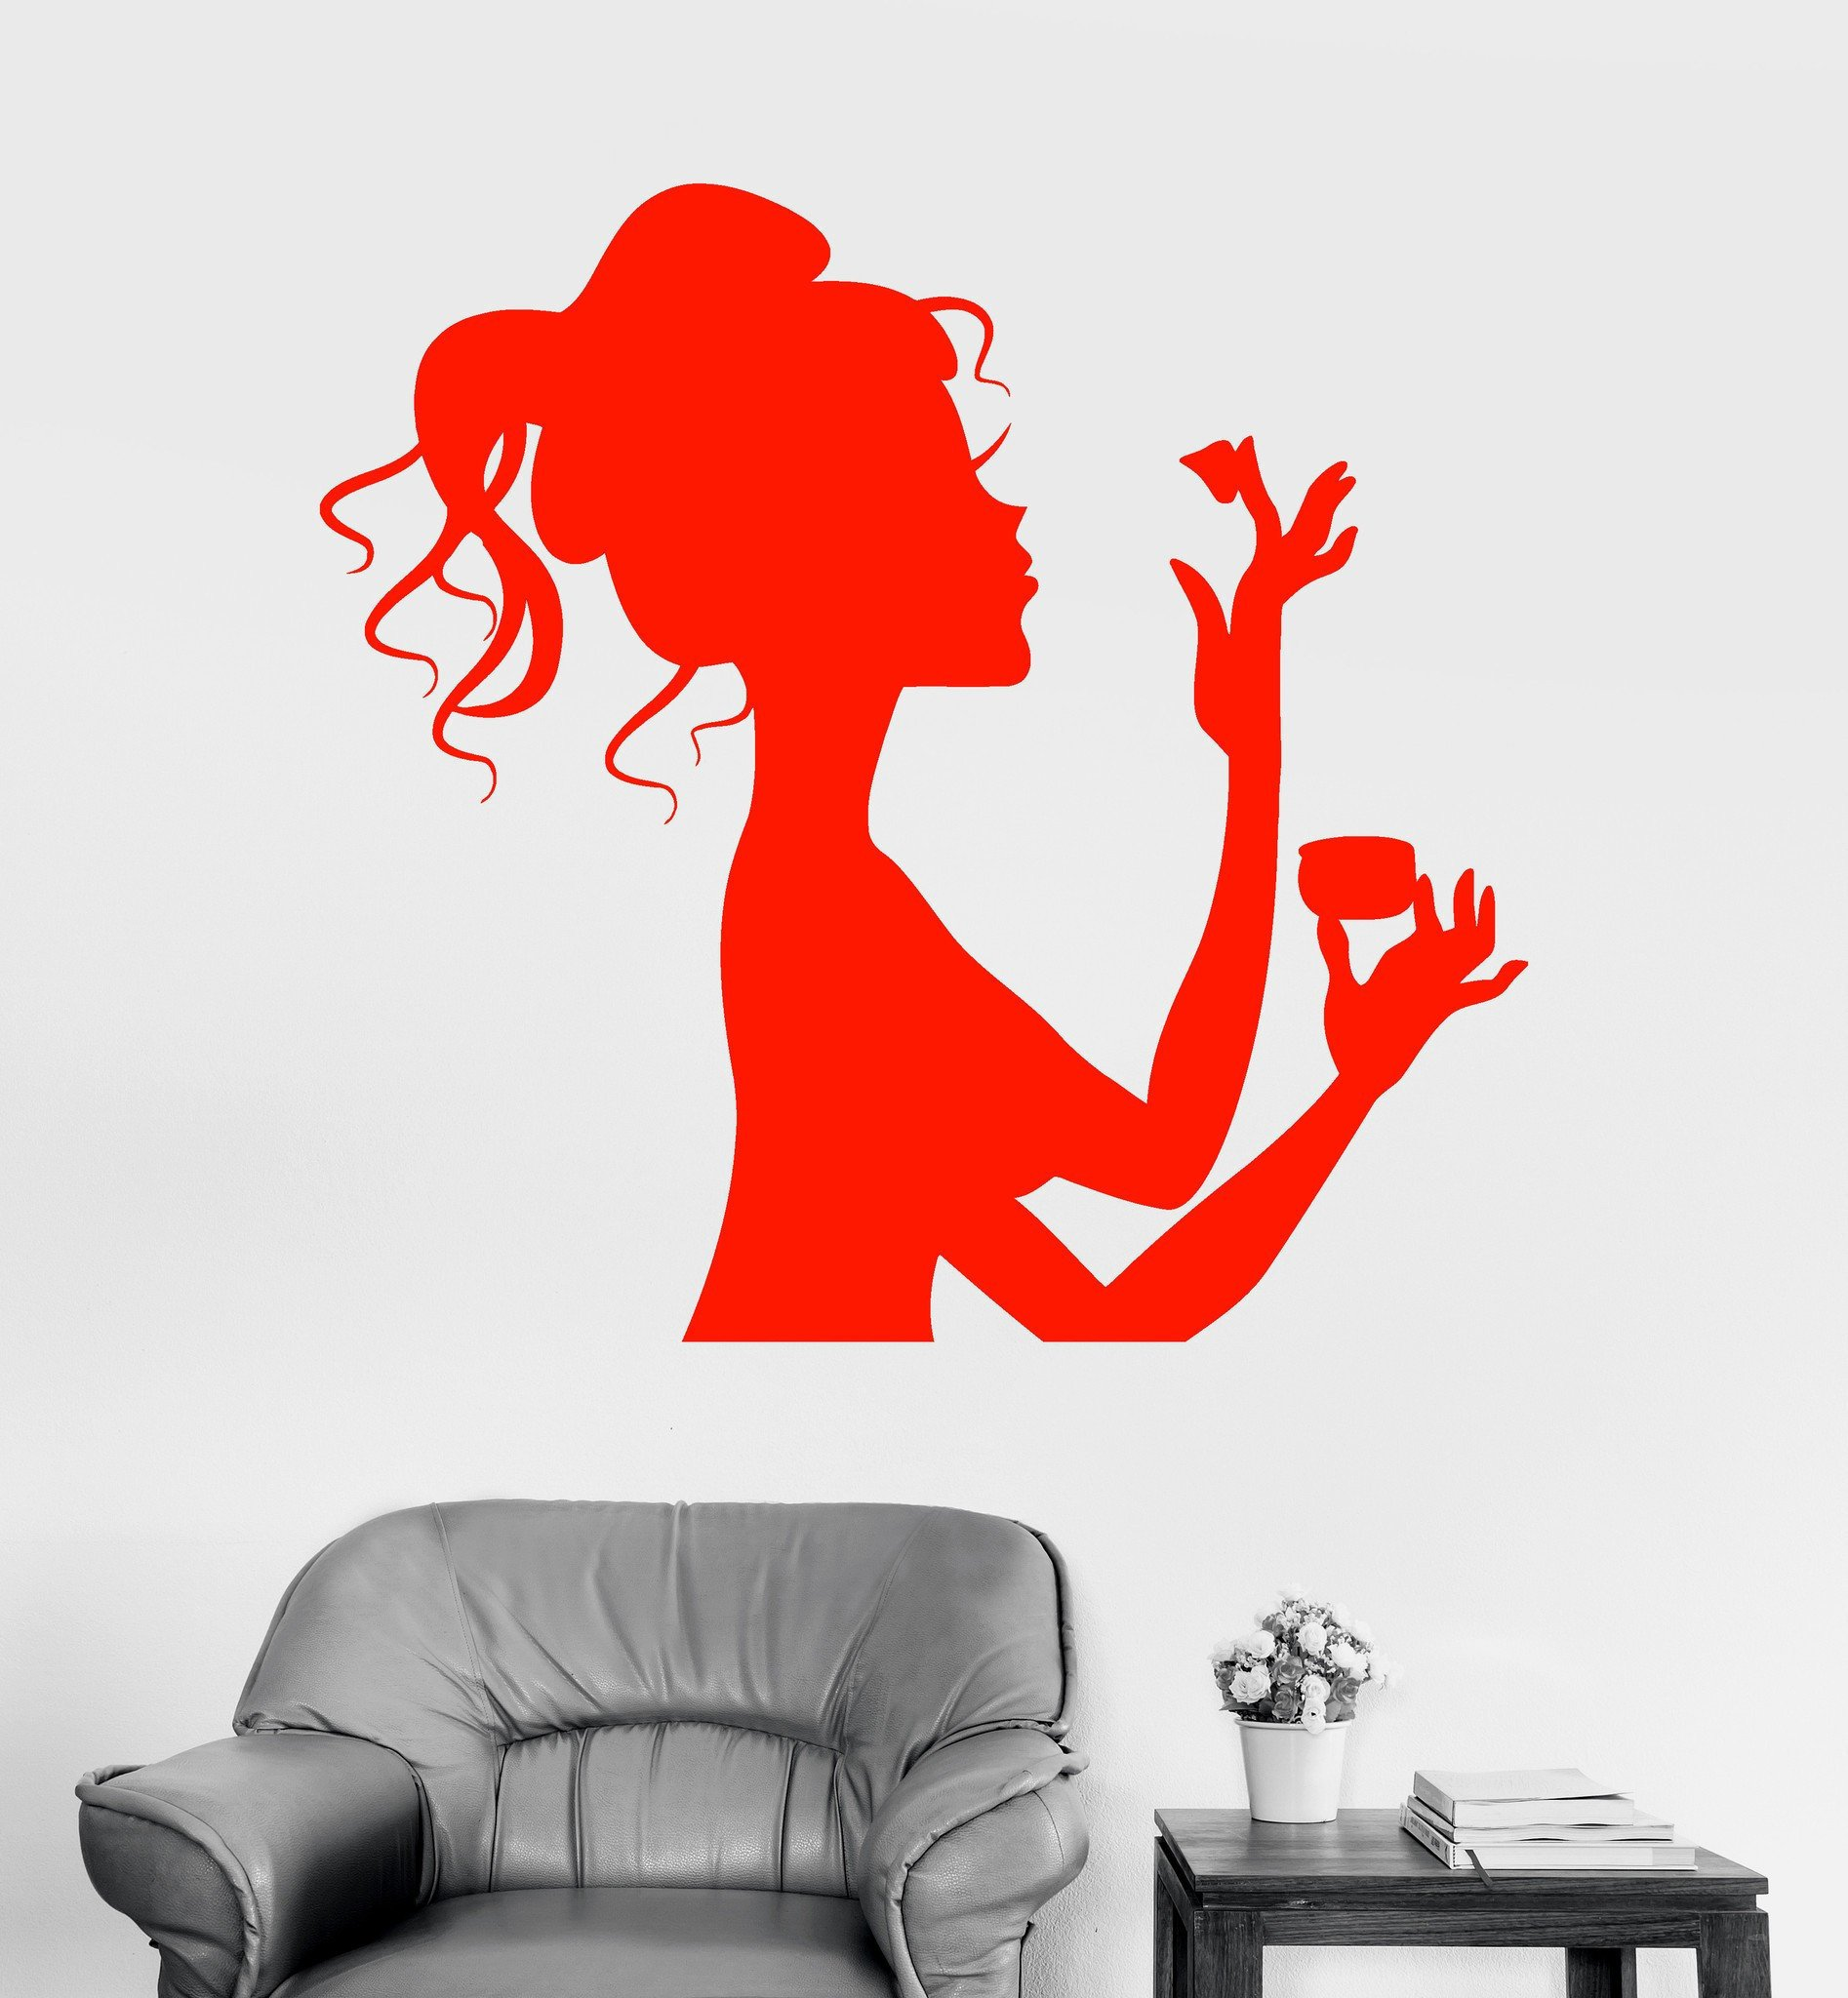 Black Bedroom Furniture Decor Fresh 17 Red Black White Wall Art Kunuzmetals